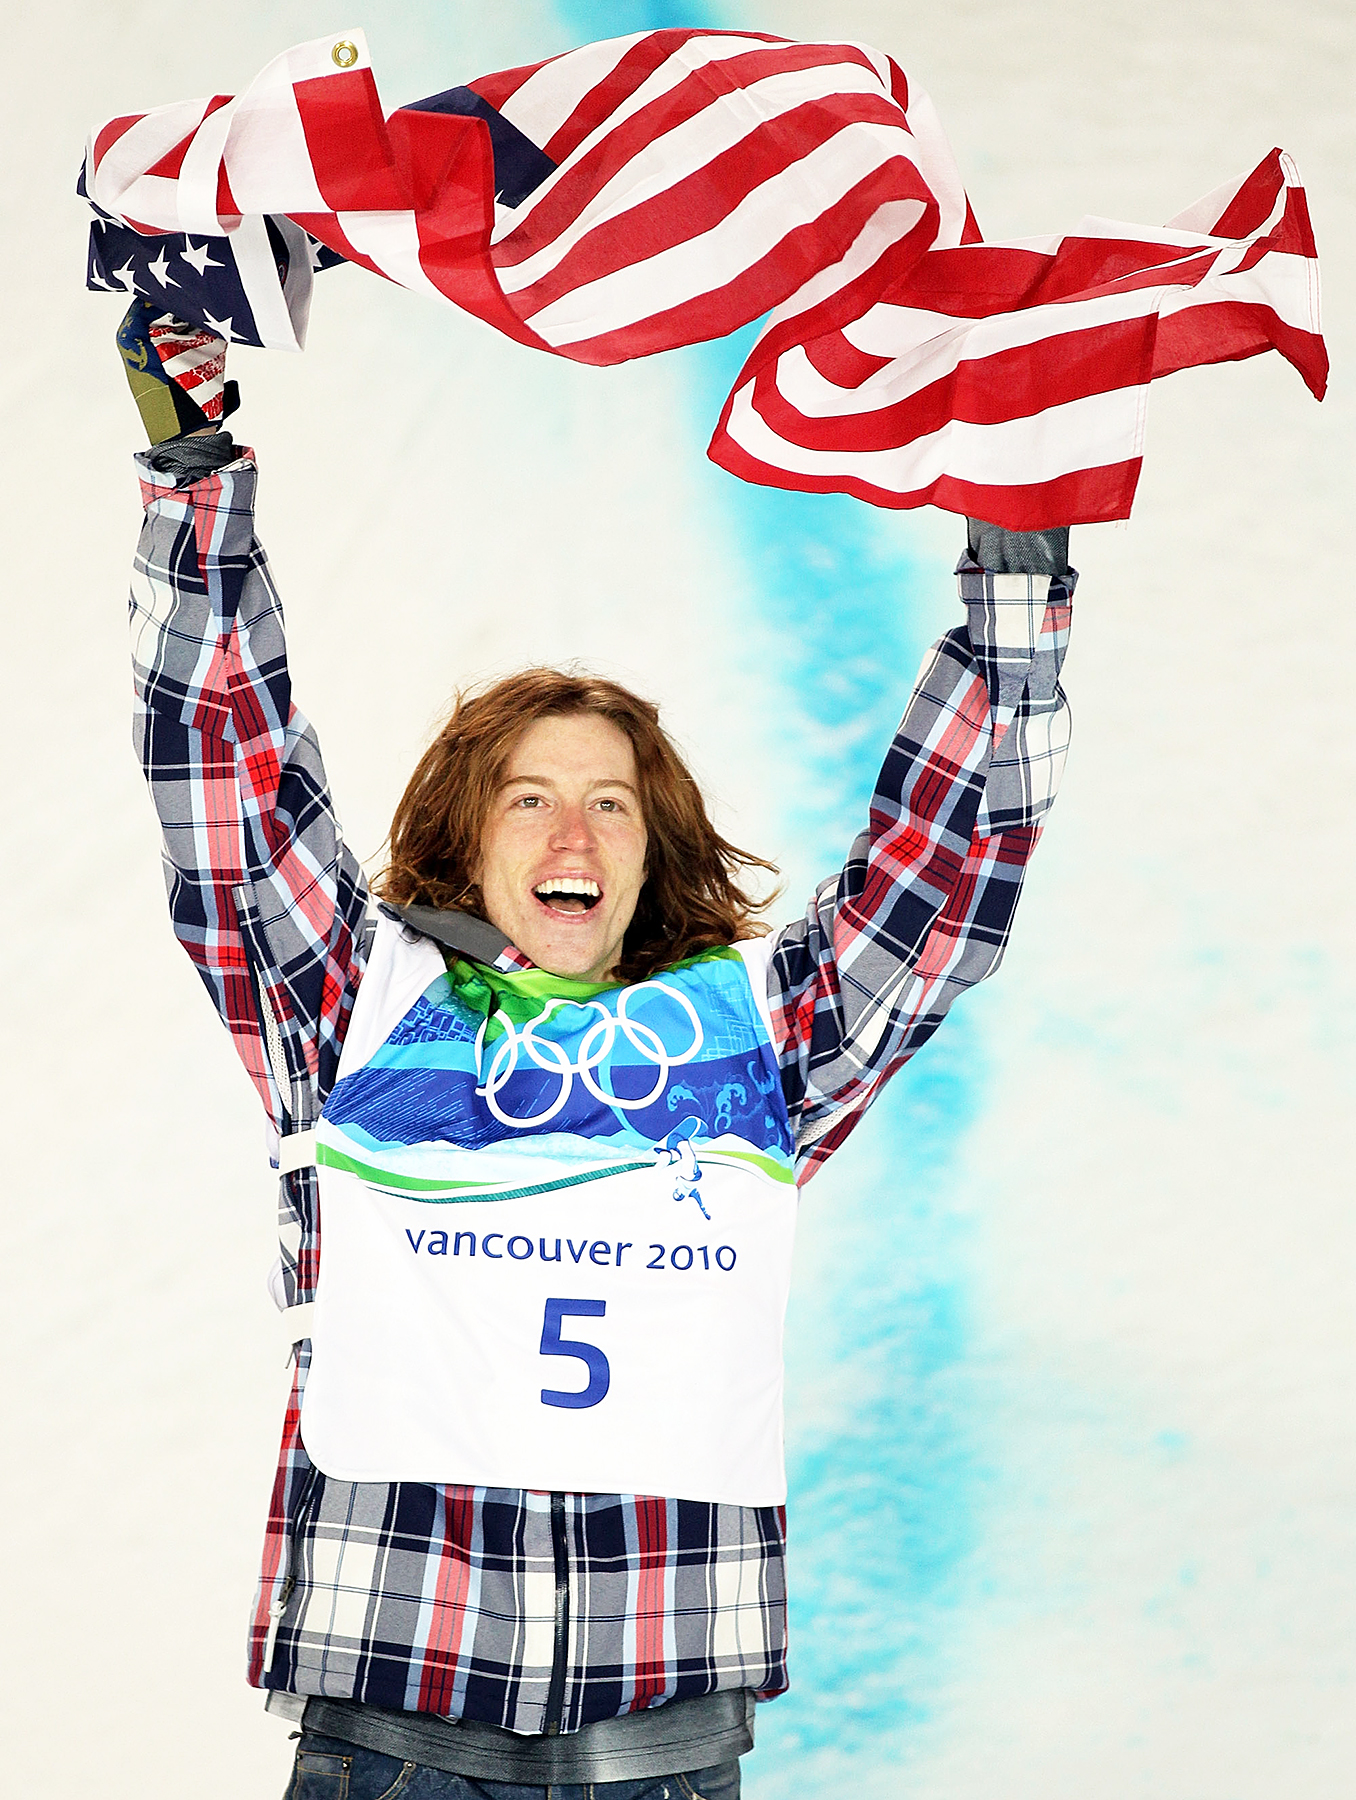 Shaun White Snowboard Men's Halfpipe final Olympics gold medal